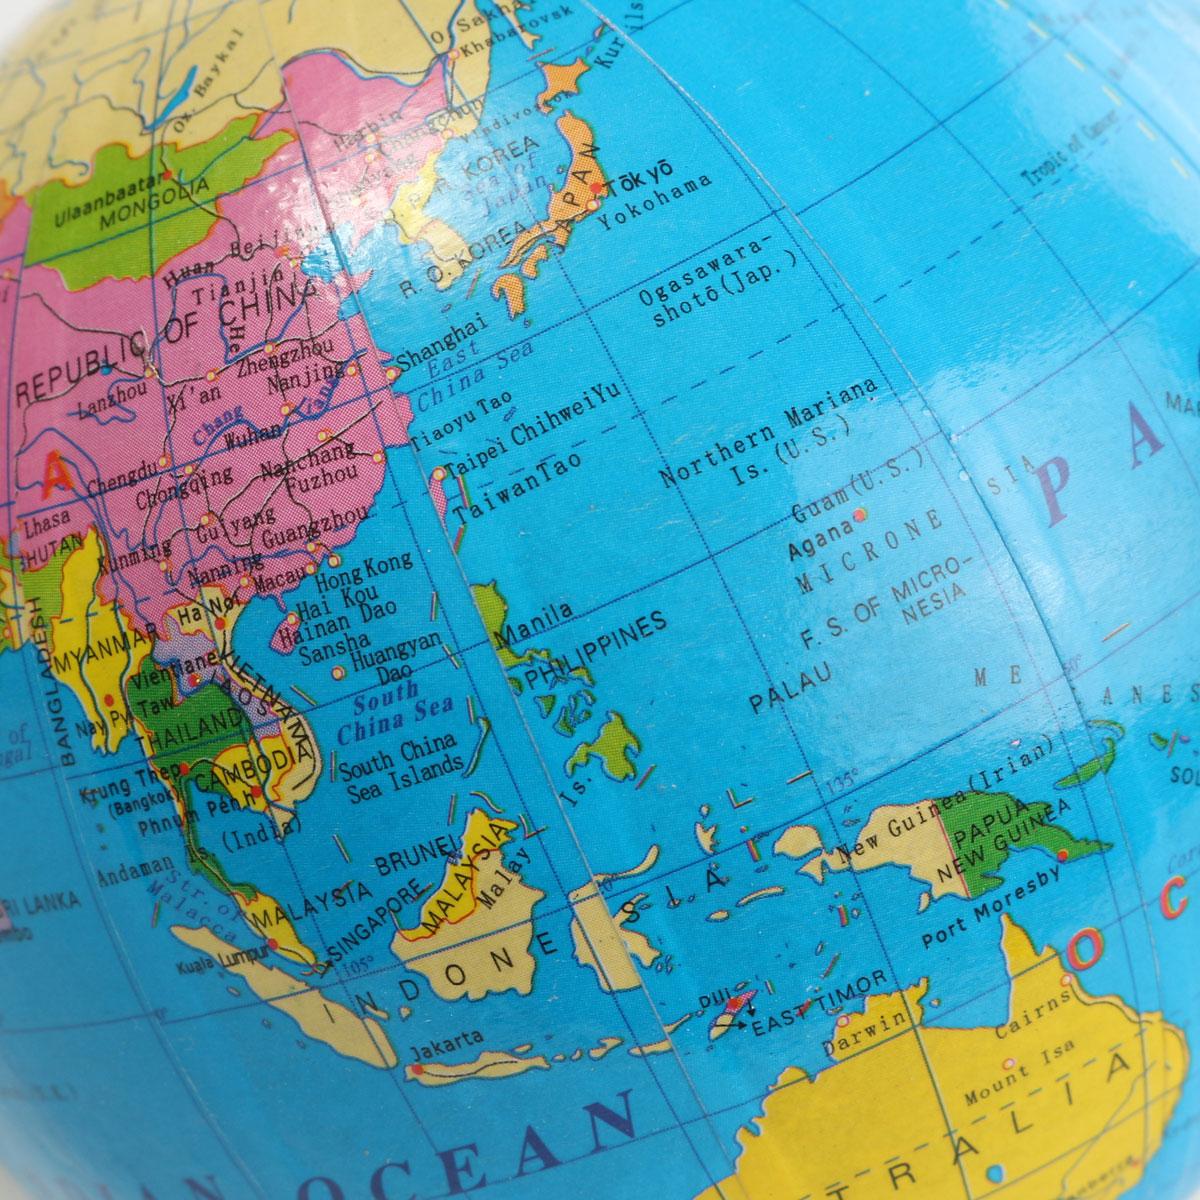 Atlas Globe Map.Kiwarm 8 5cm Delicate World Globe Atlas Map With Swivel Stand For